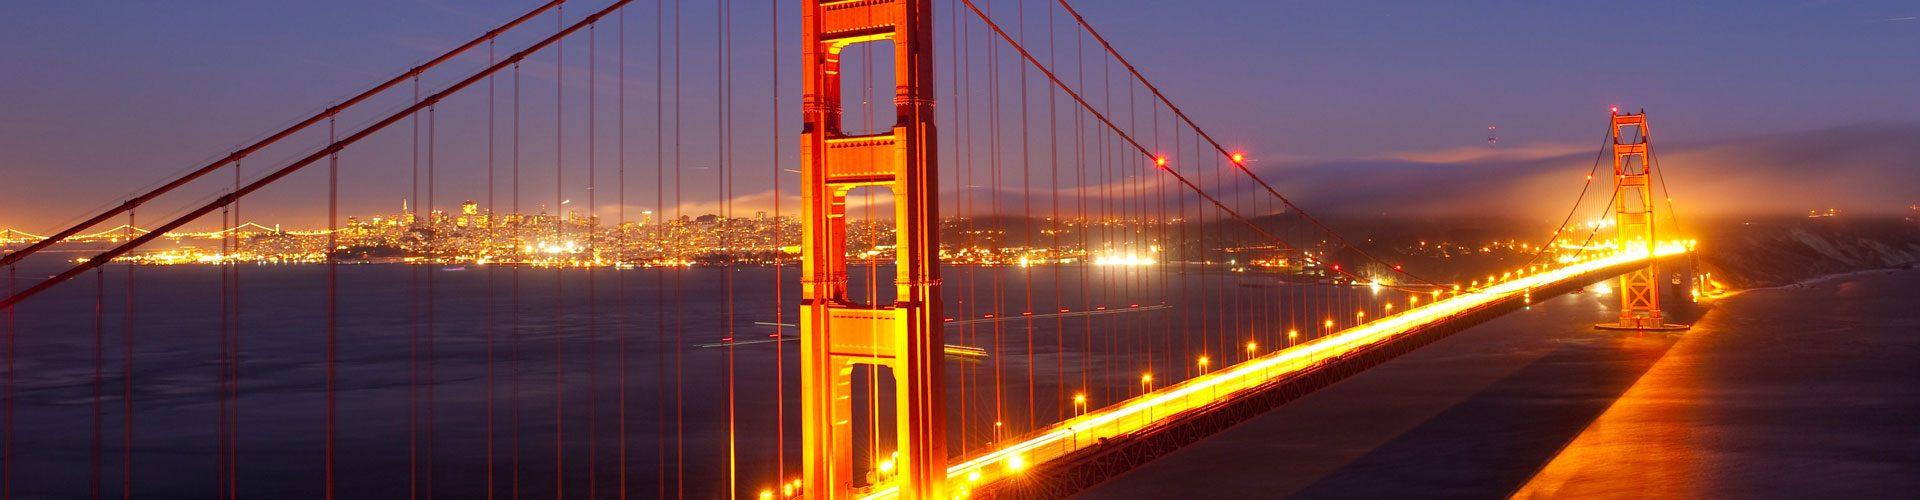 Golden Gate Brücke, San Francisco, Kalifornien